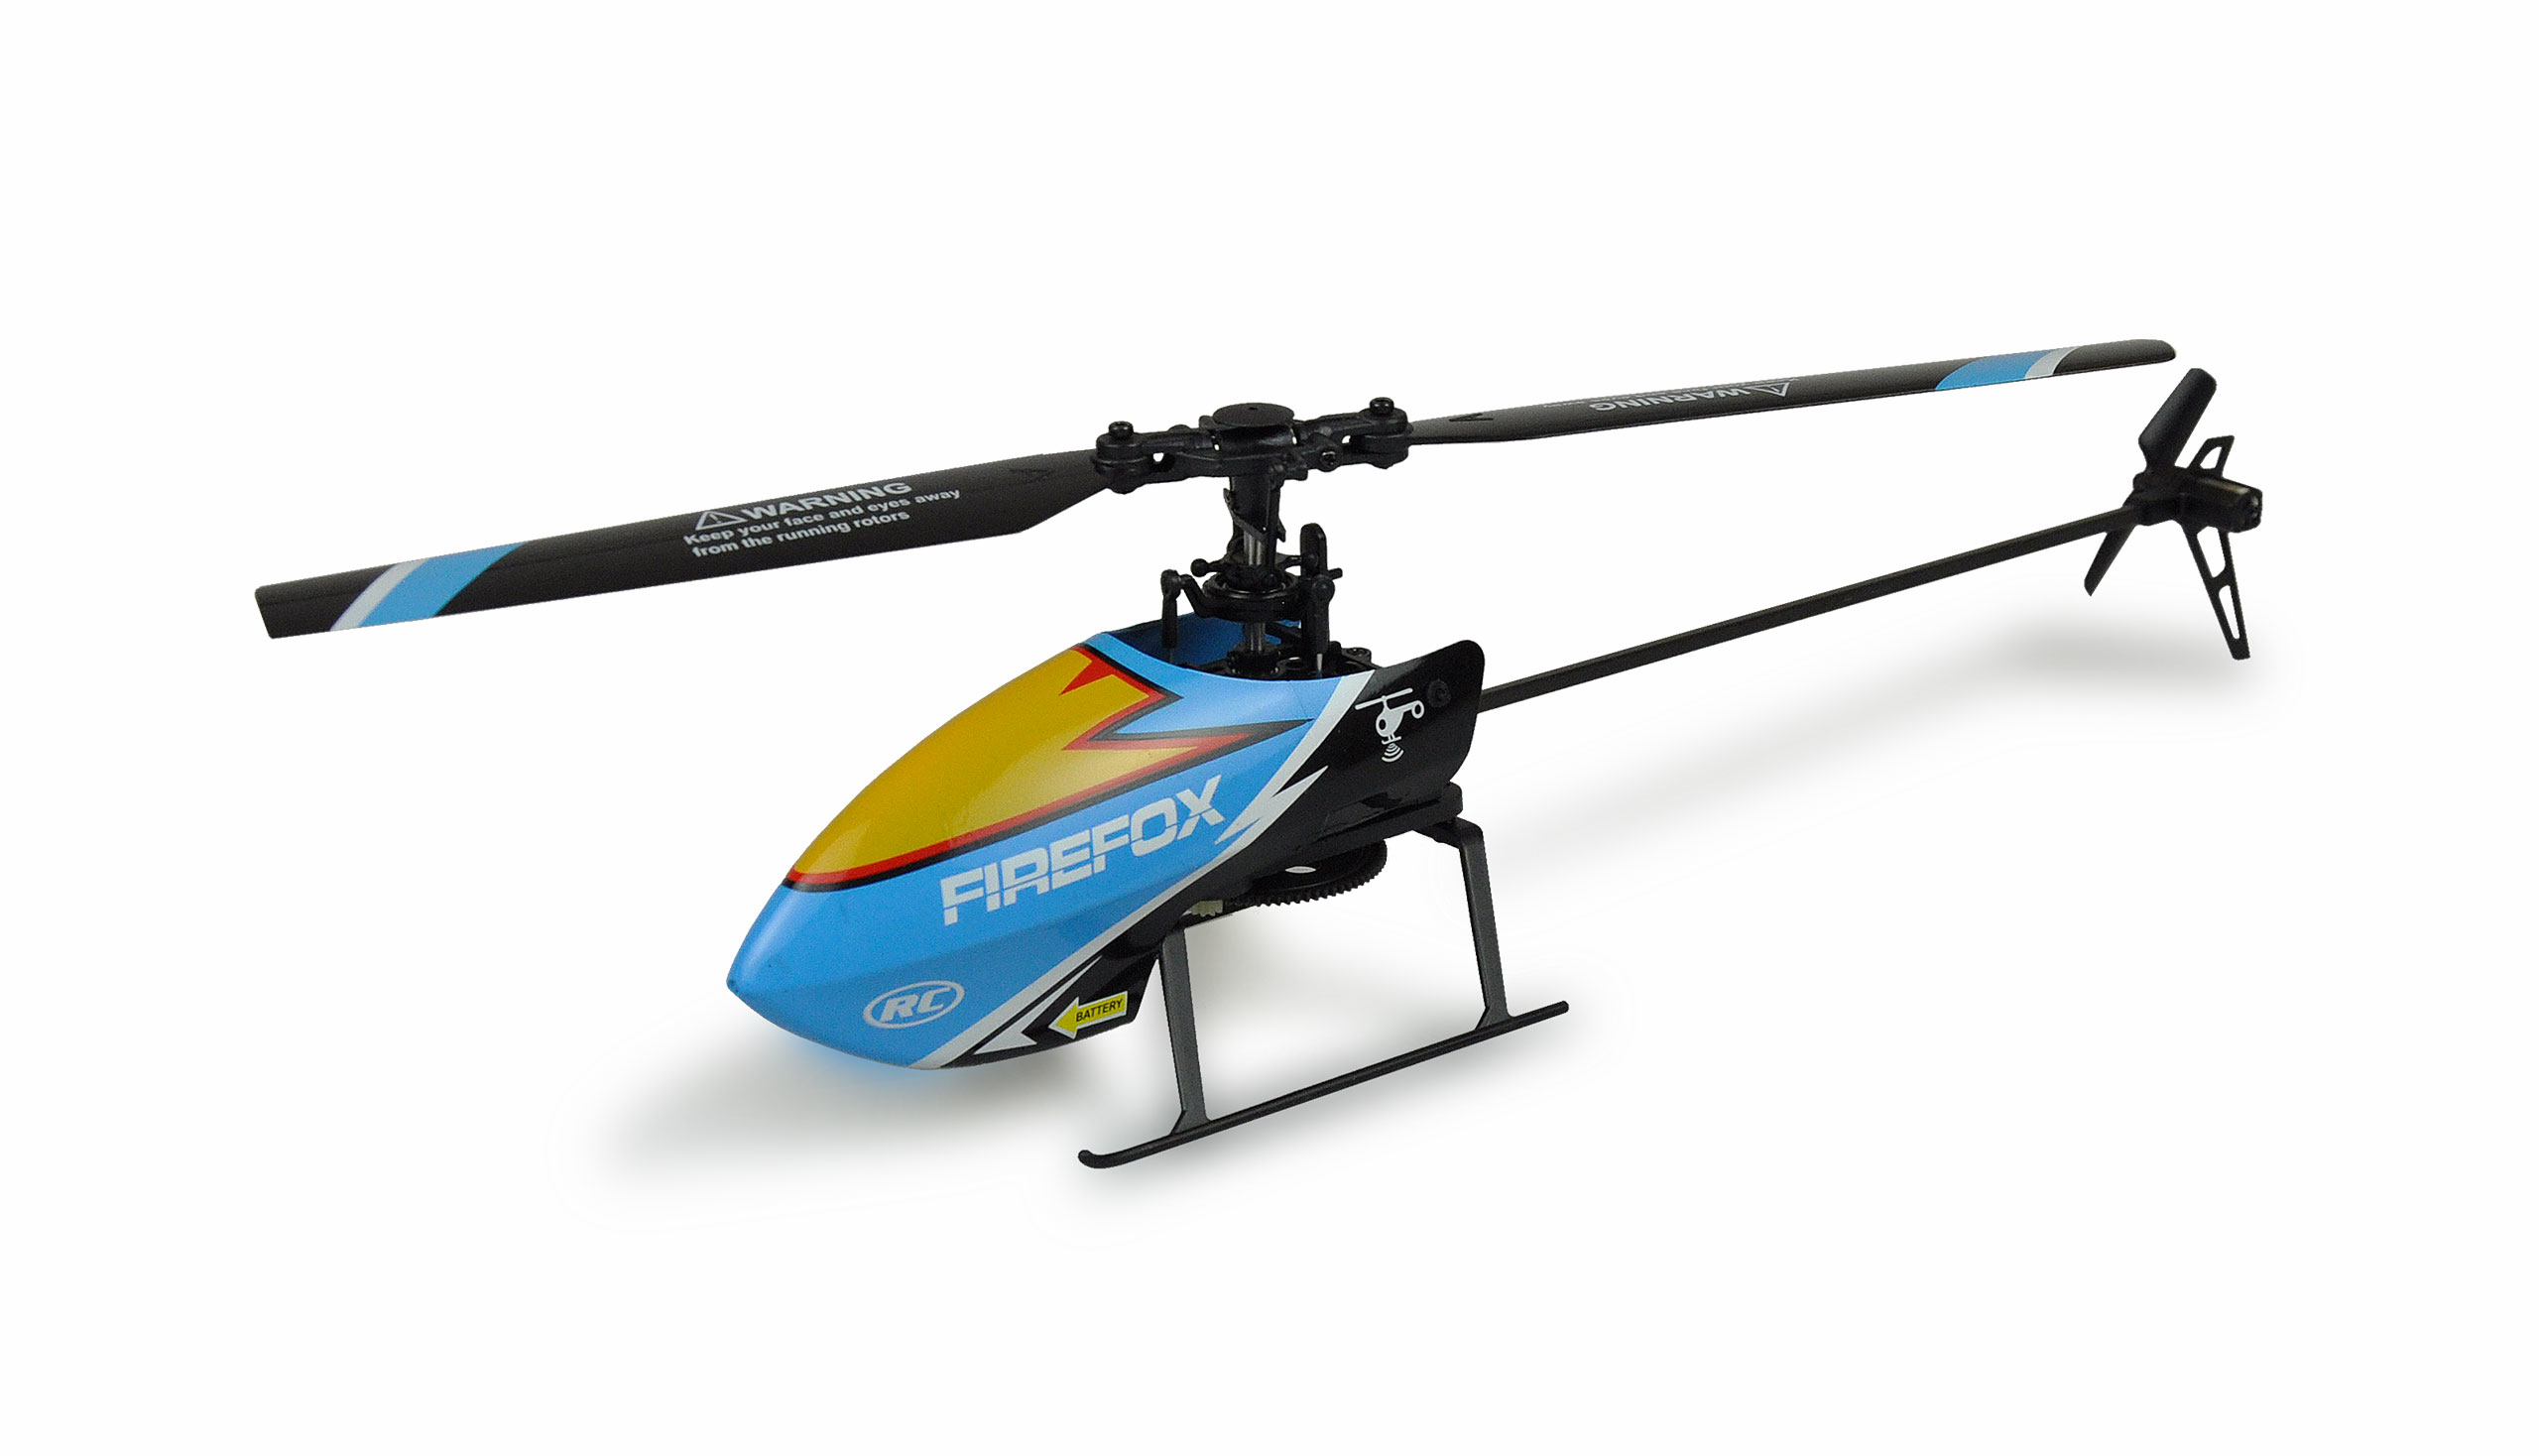 Amewi AFX4 XP - Helikopter - Flugbereit (RTF) - Elektromotor - 1 Rotoren - 51 g